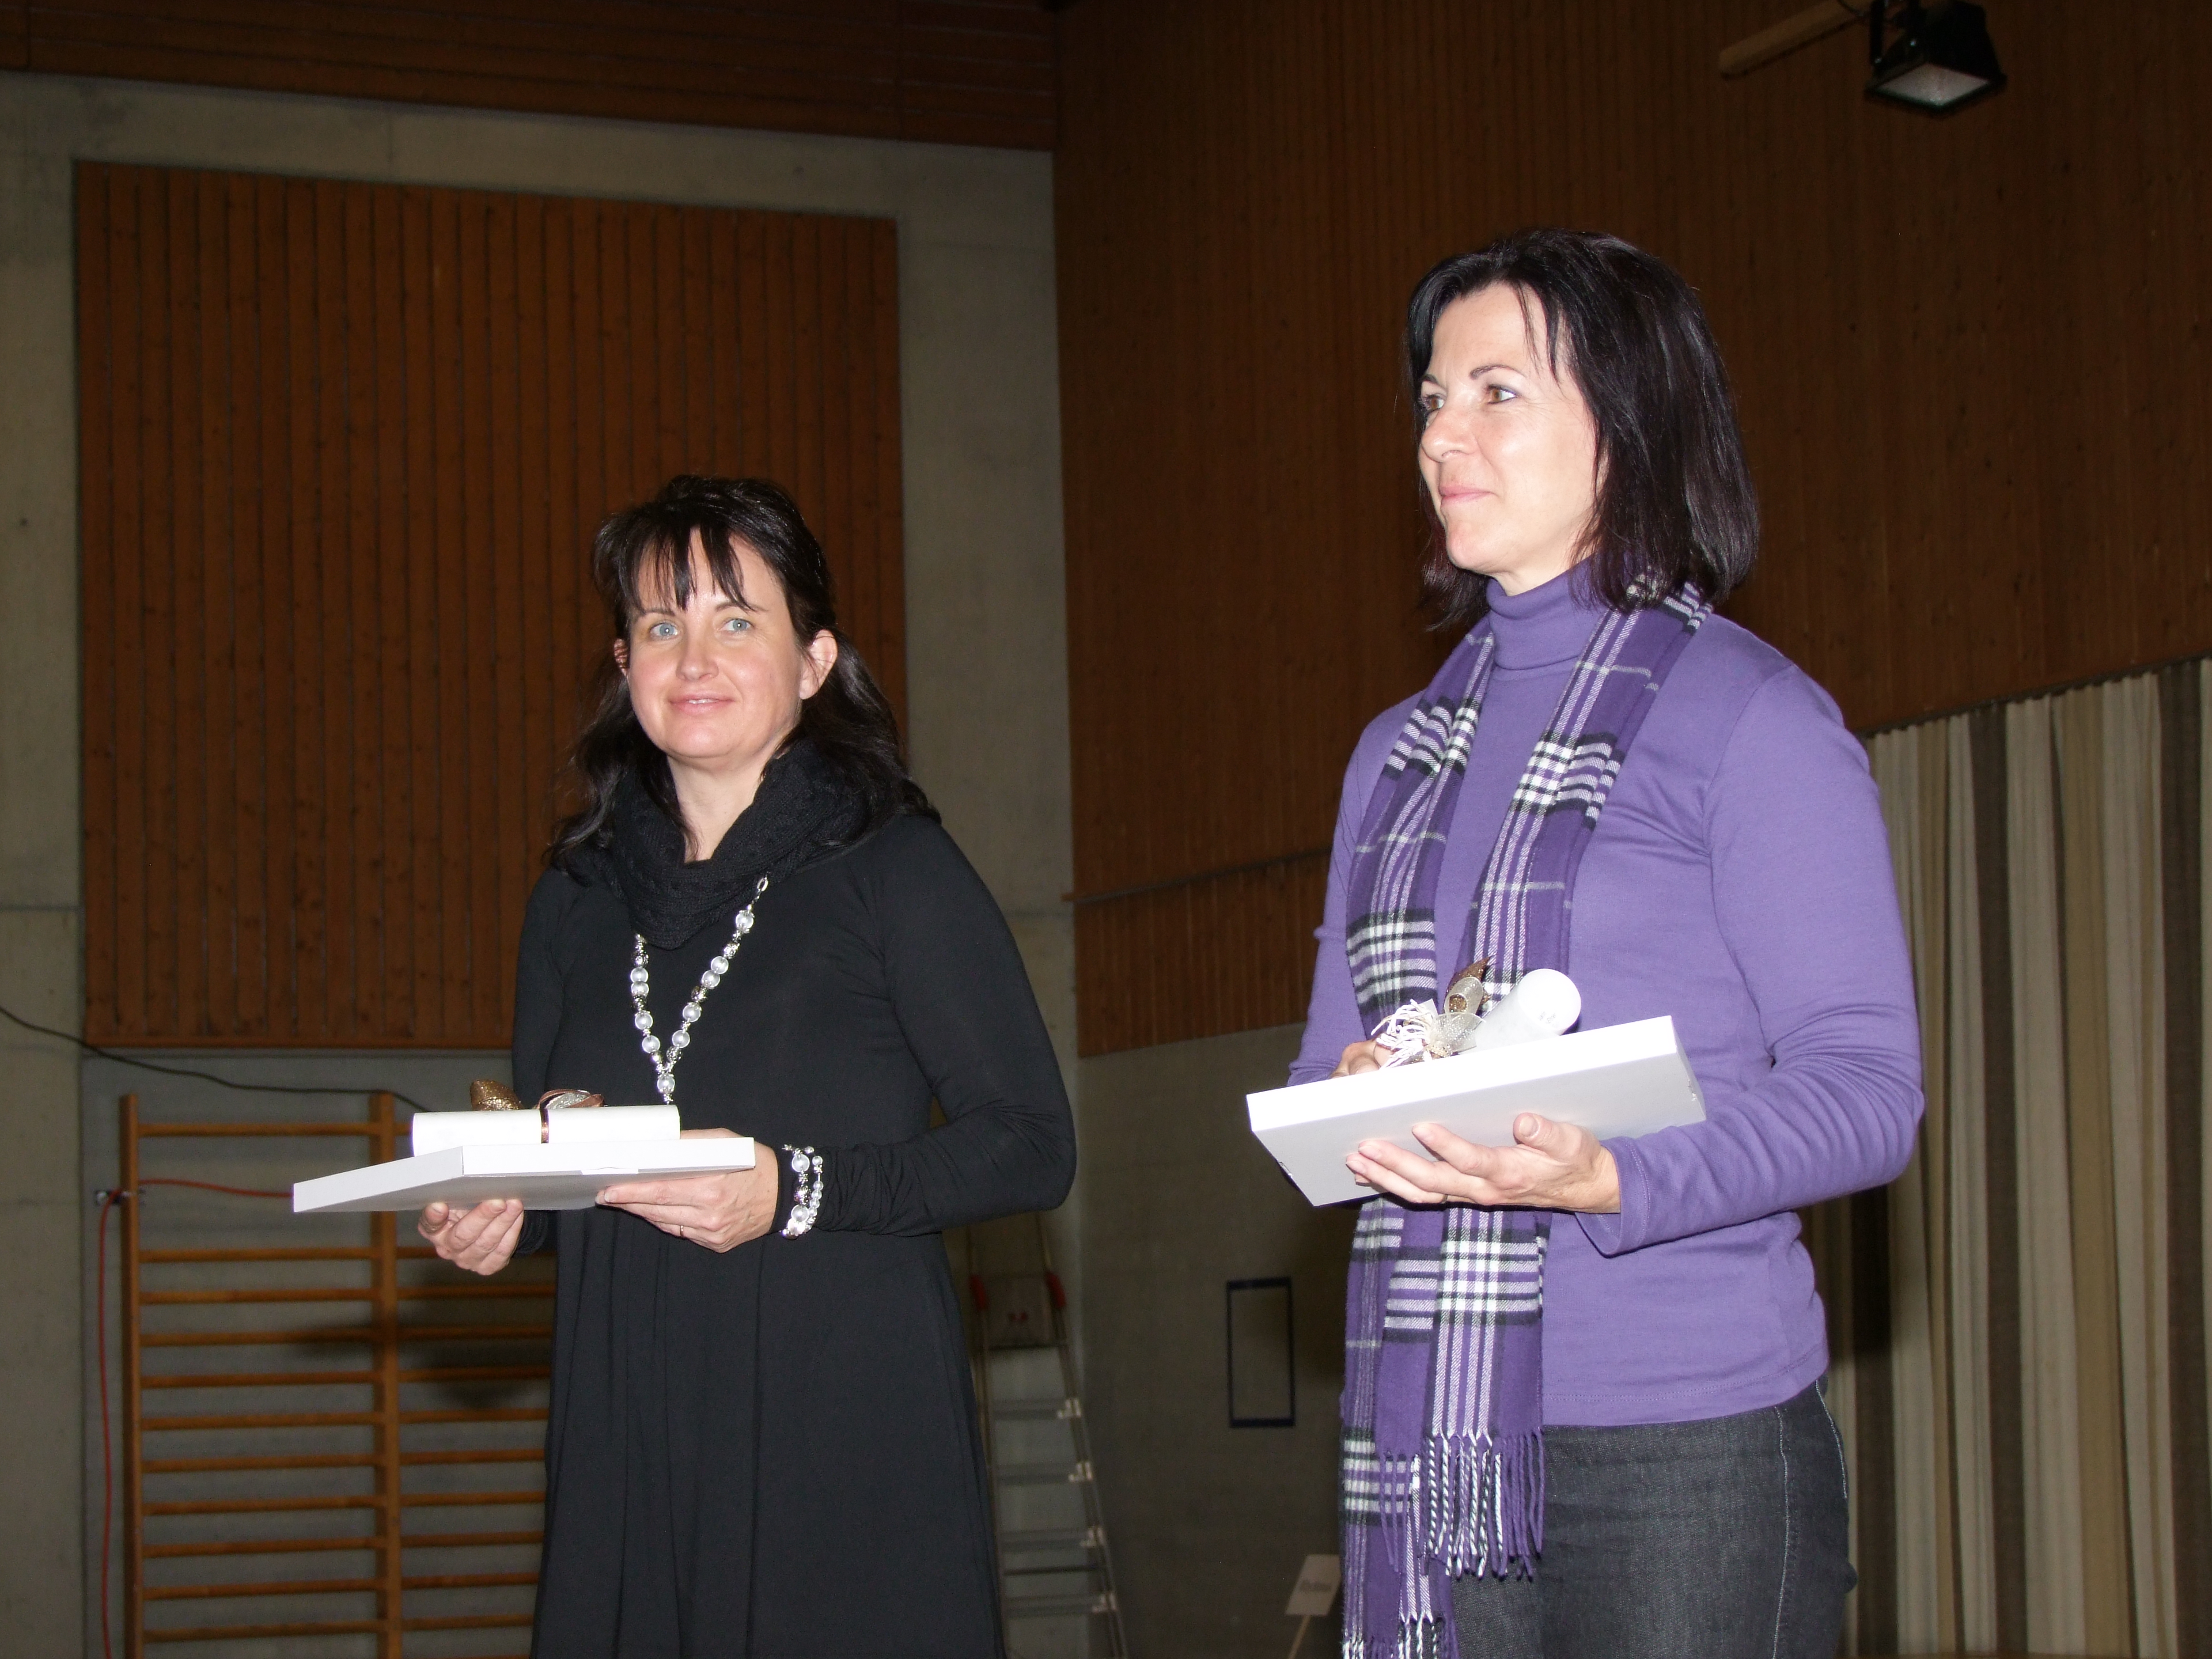 0810-2010-KirchengesangstagBuochs